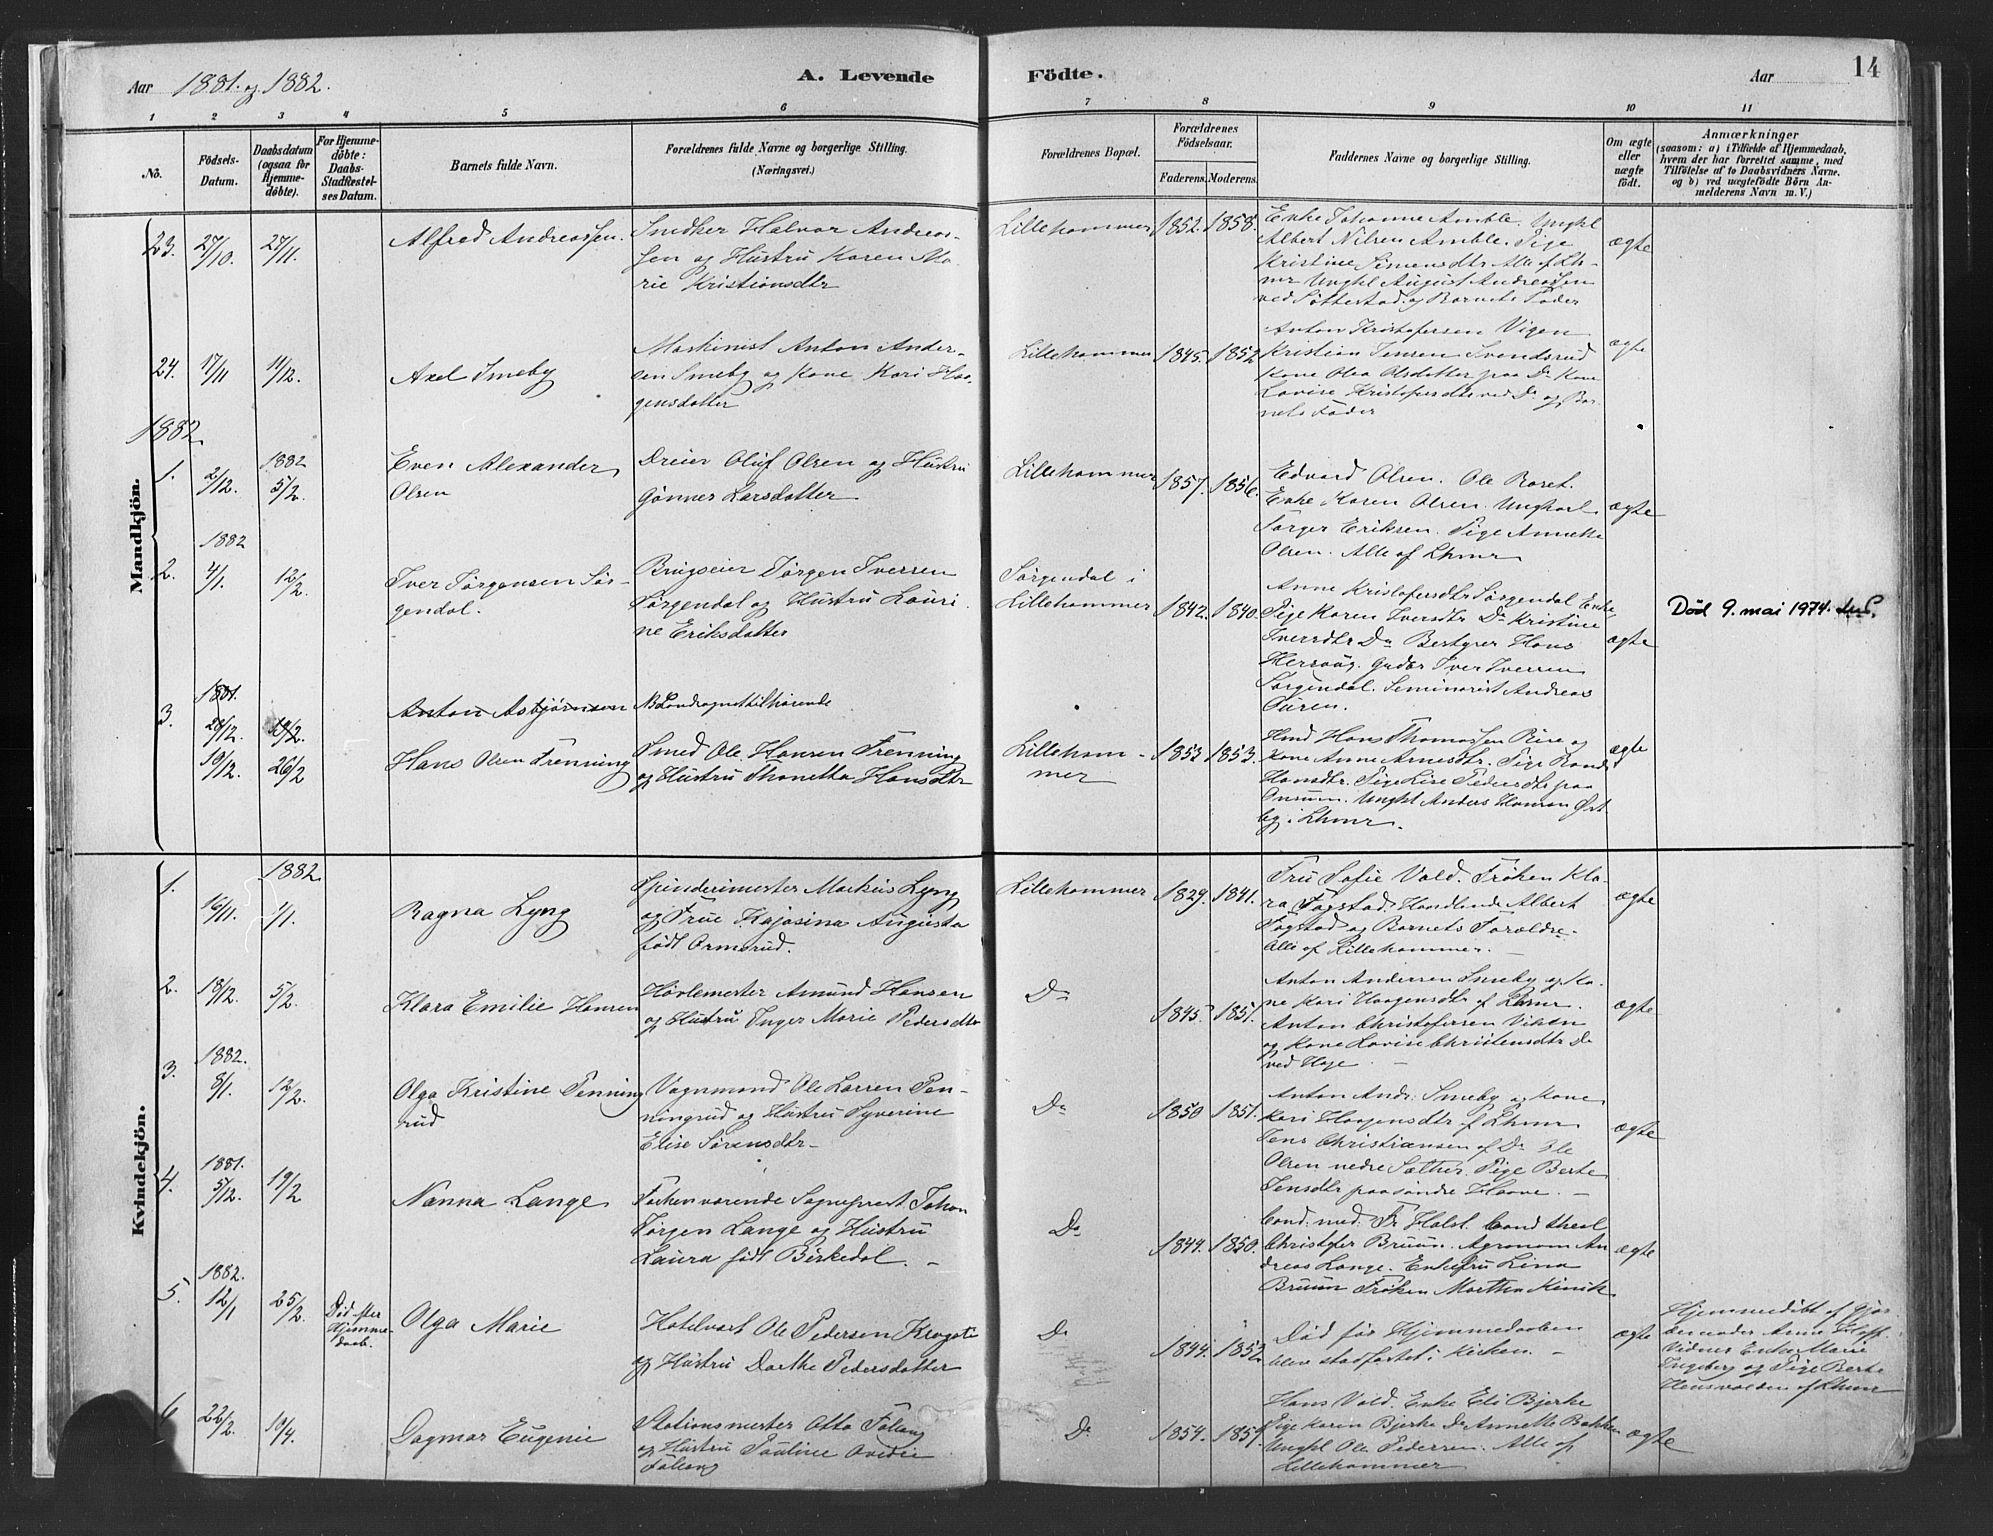 SAH, Fåberg prestekontor, H/Ha/Haa/L0010: Ministerialbok nr. 10, 1879-1900, s. 14